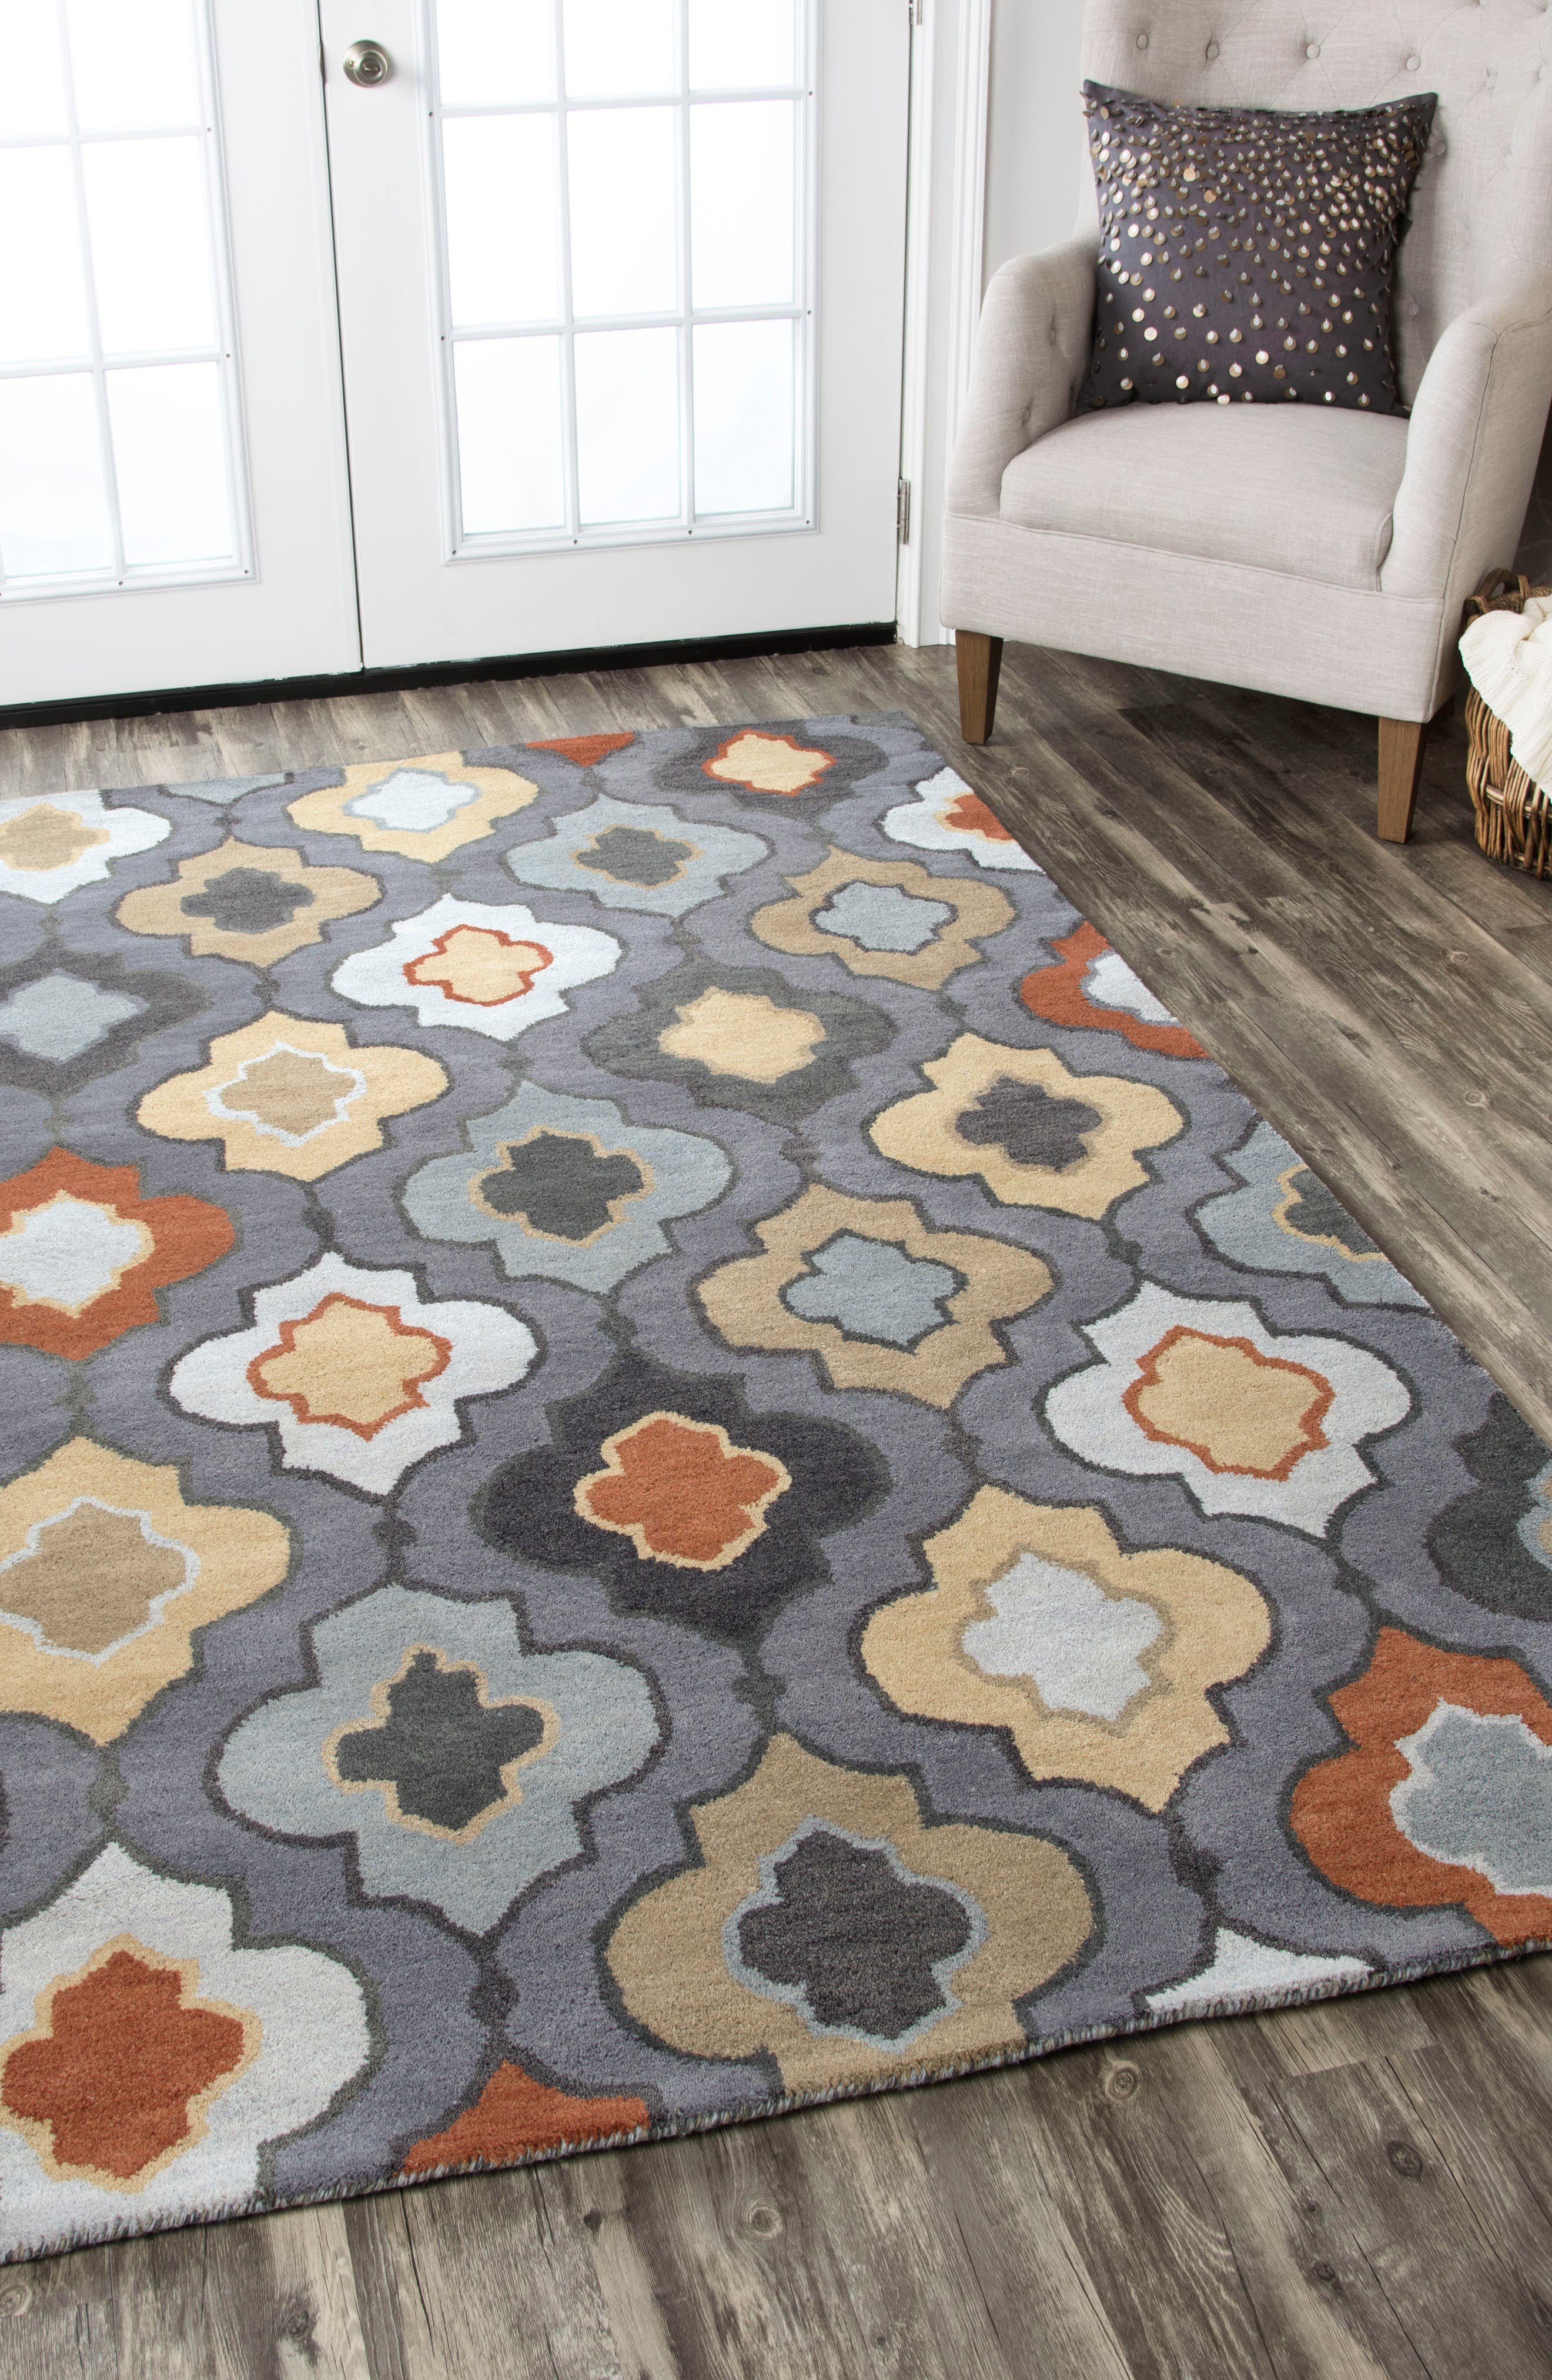 'Quatrefoil' Hand Tufted Wool Area Rug,                             Alternate thumbnail 2, color,                             030